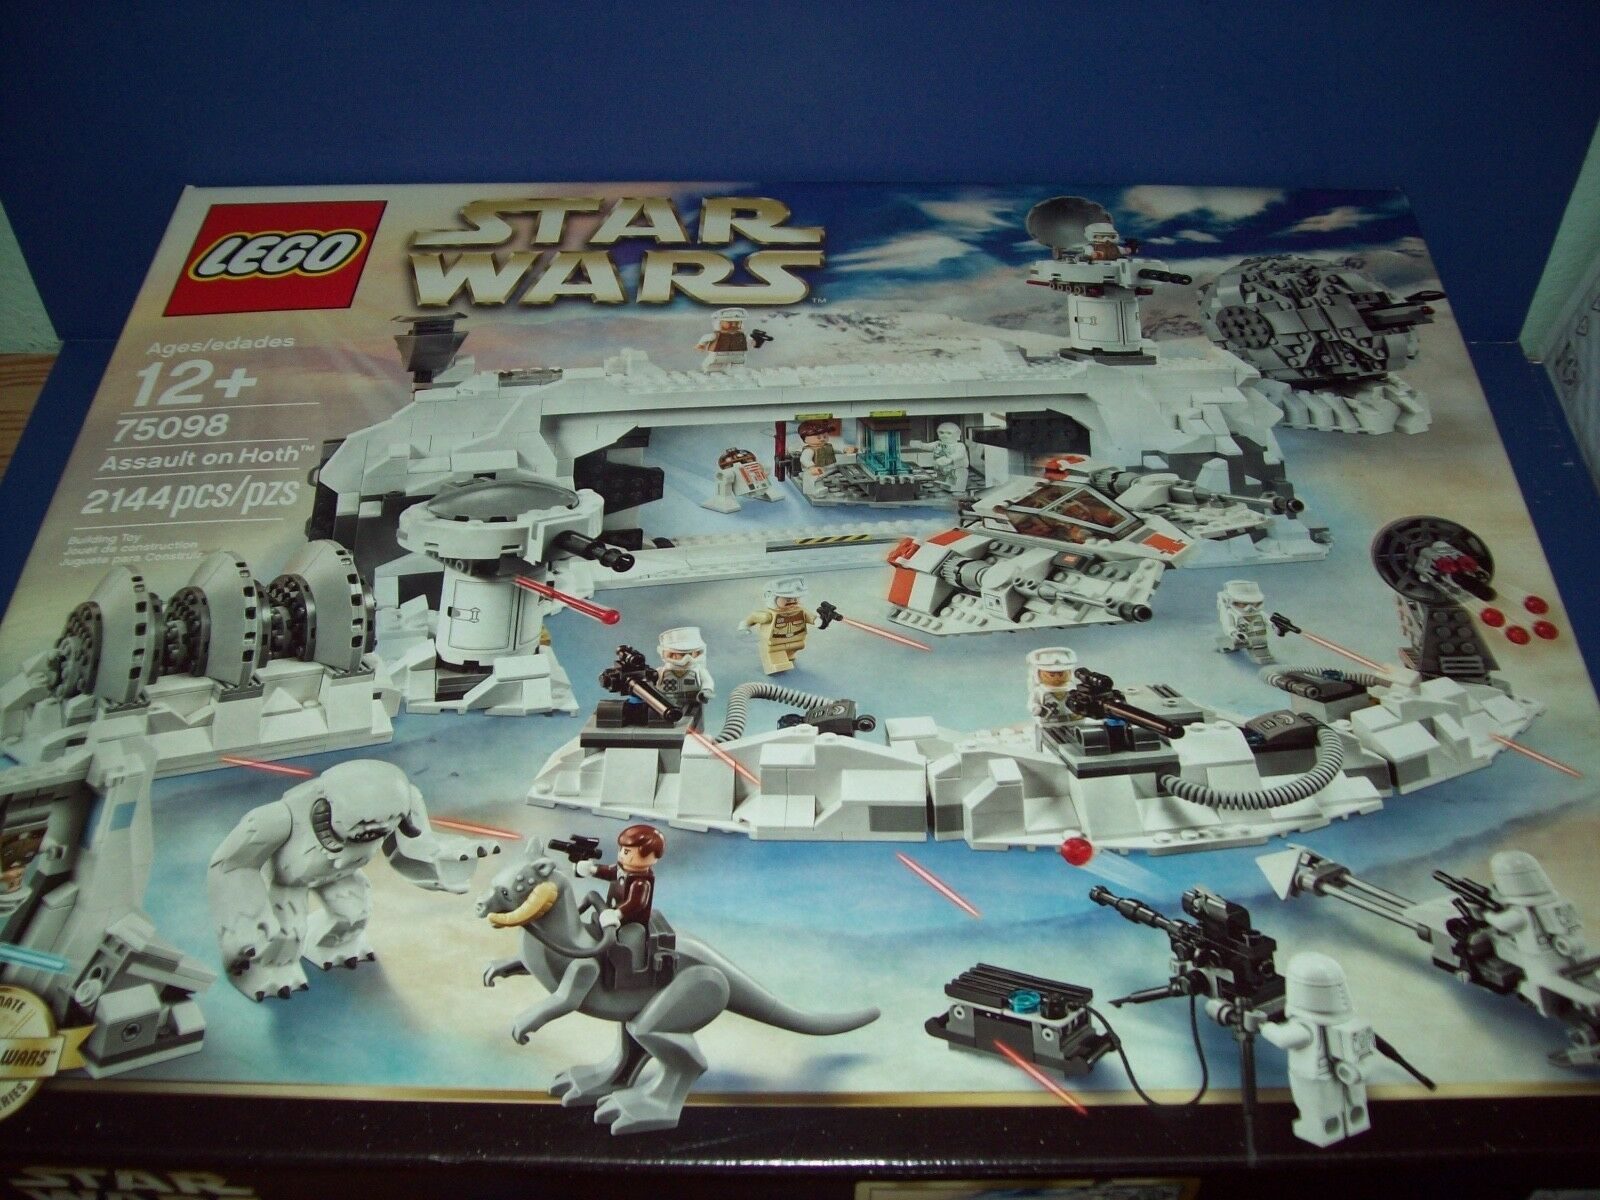 Lego 75098 Star Wars Ucs Assault On Hoth Nisb Nuovo Esclusivo